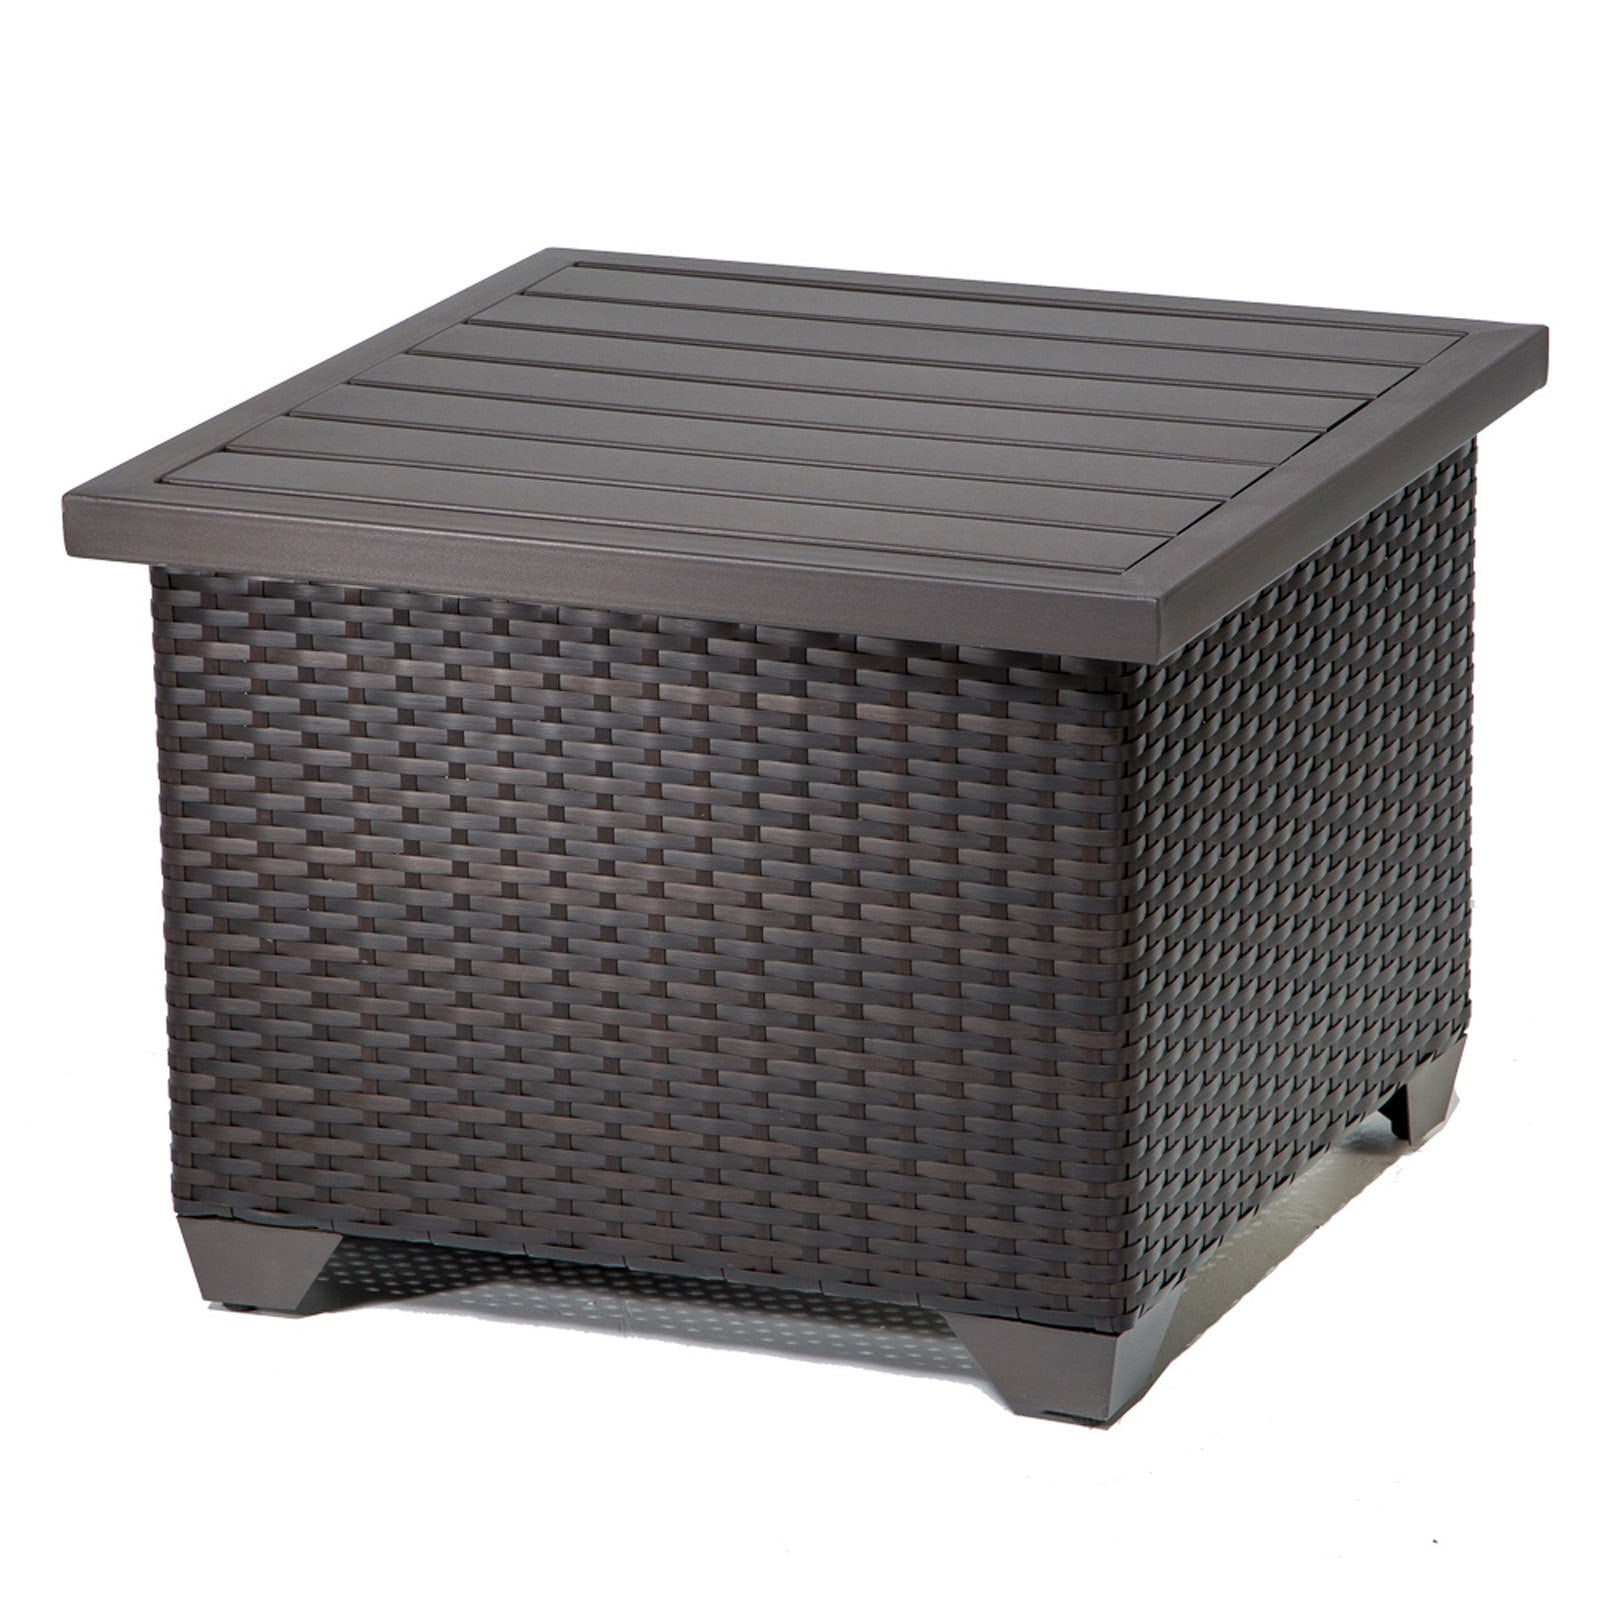 TK Classics Barbados Collection Outdoor Wicker Patio Furniture Set